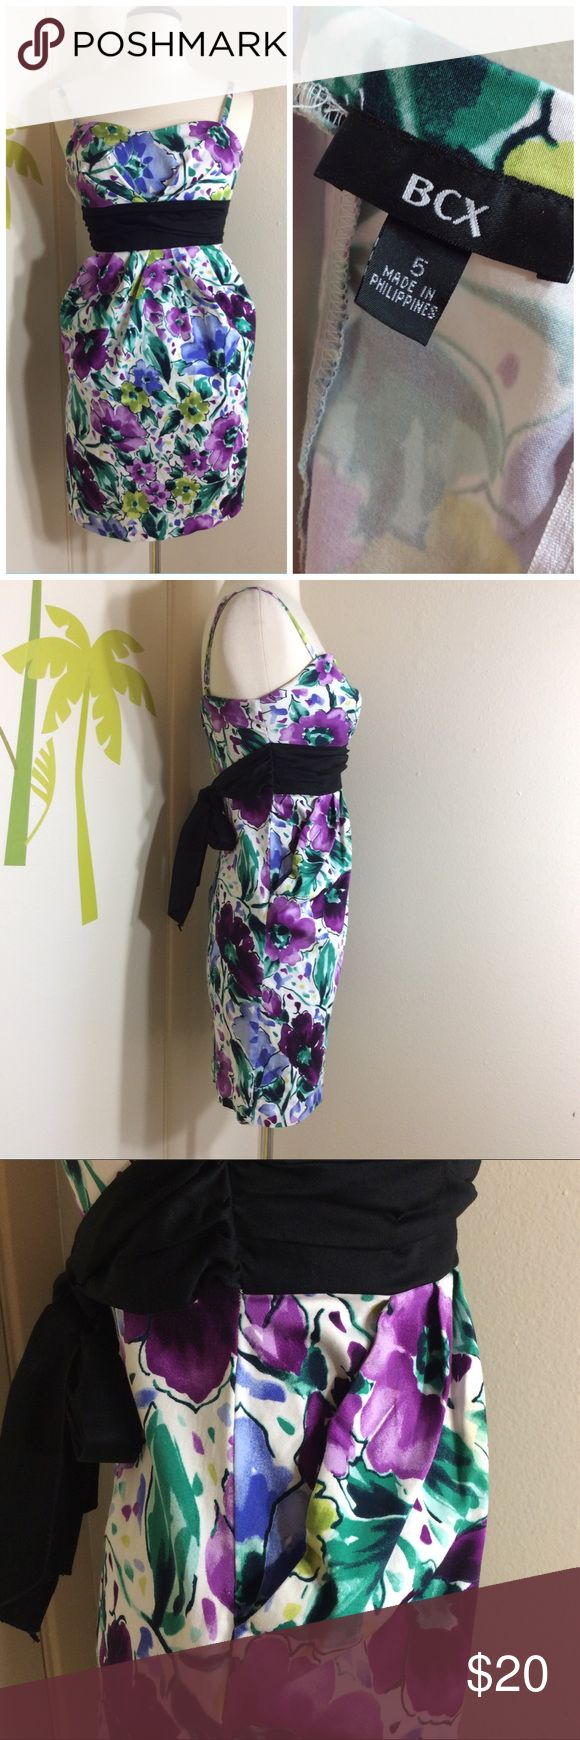 BCX Junior Purple Multi Color Cocktail Dress Sz 5 In great condition. Adjustable Spaghetti Strap Dress. Two side pockets. Ties back. BCX Dresses Mini